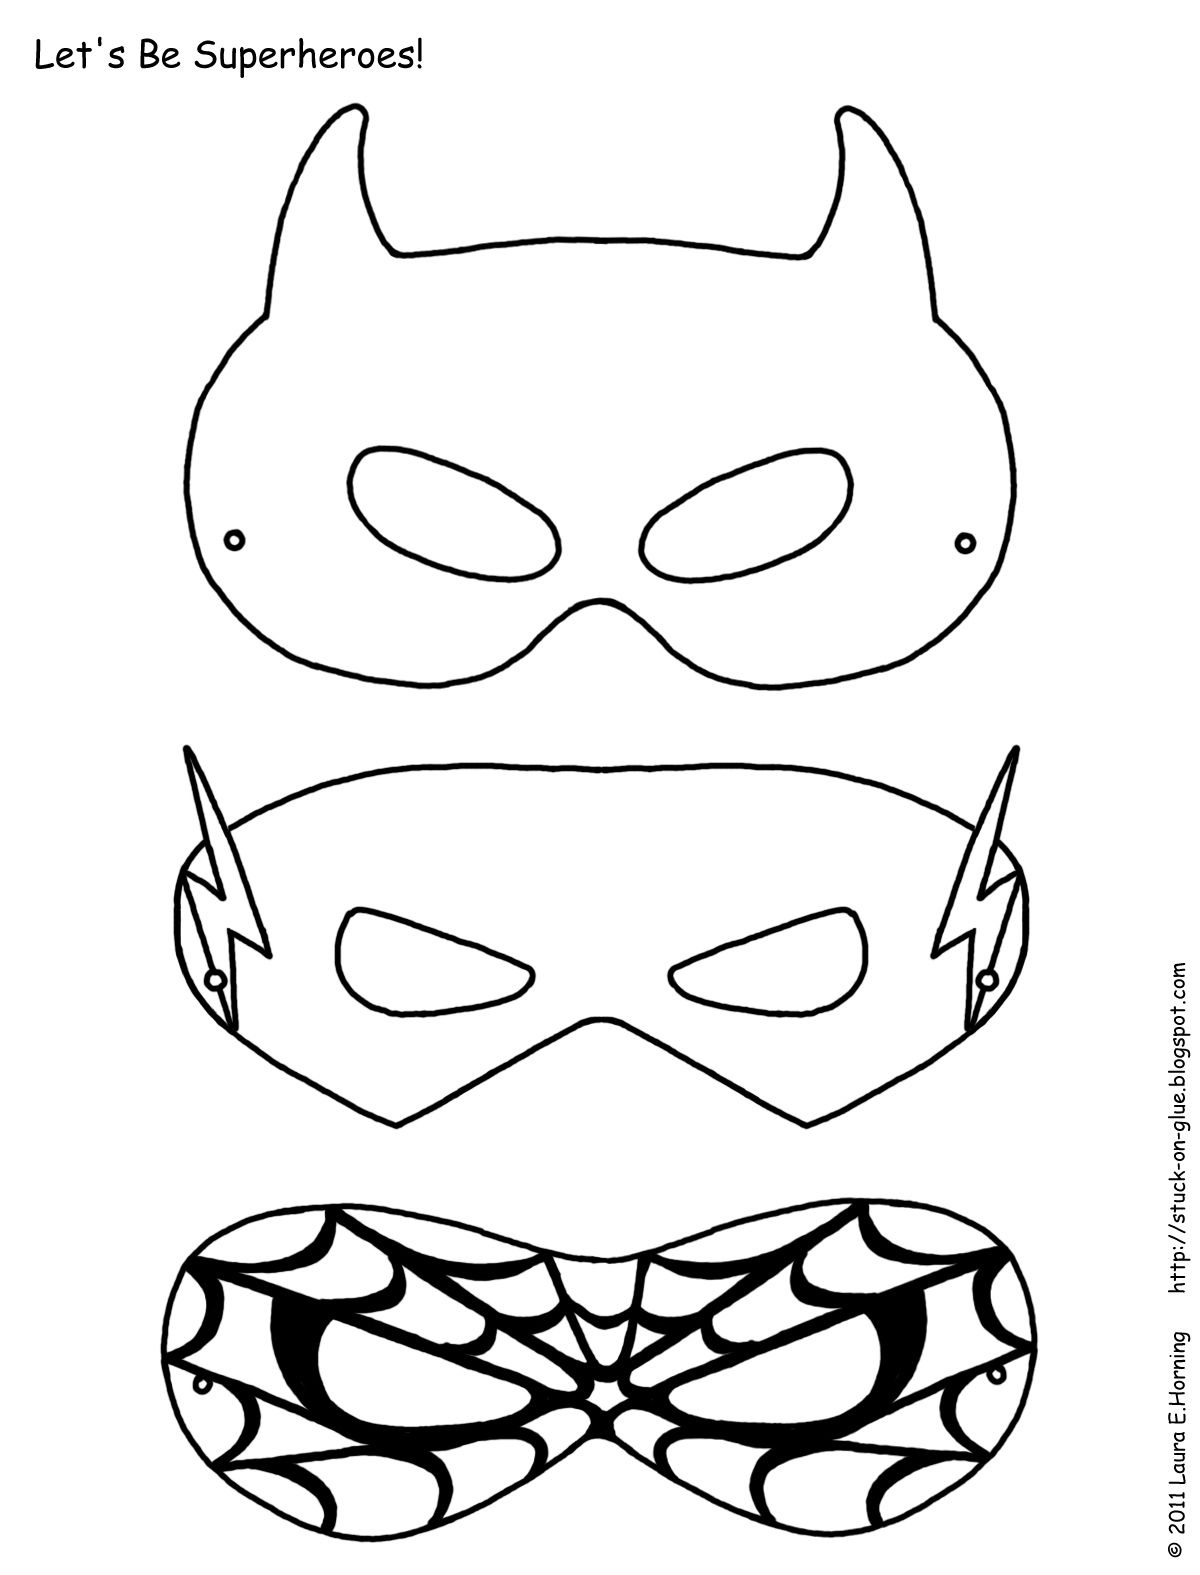 Super Hero Masks | Superhero Mask Printable Templates Coloring Pages - Free Printable Face Masks